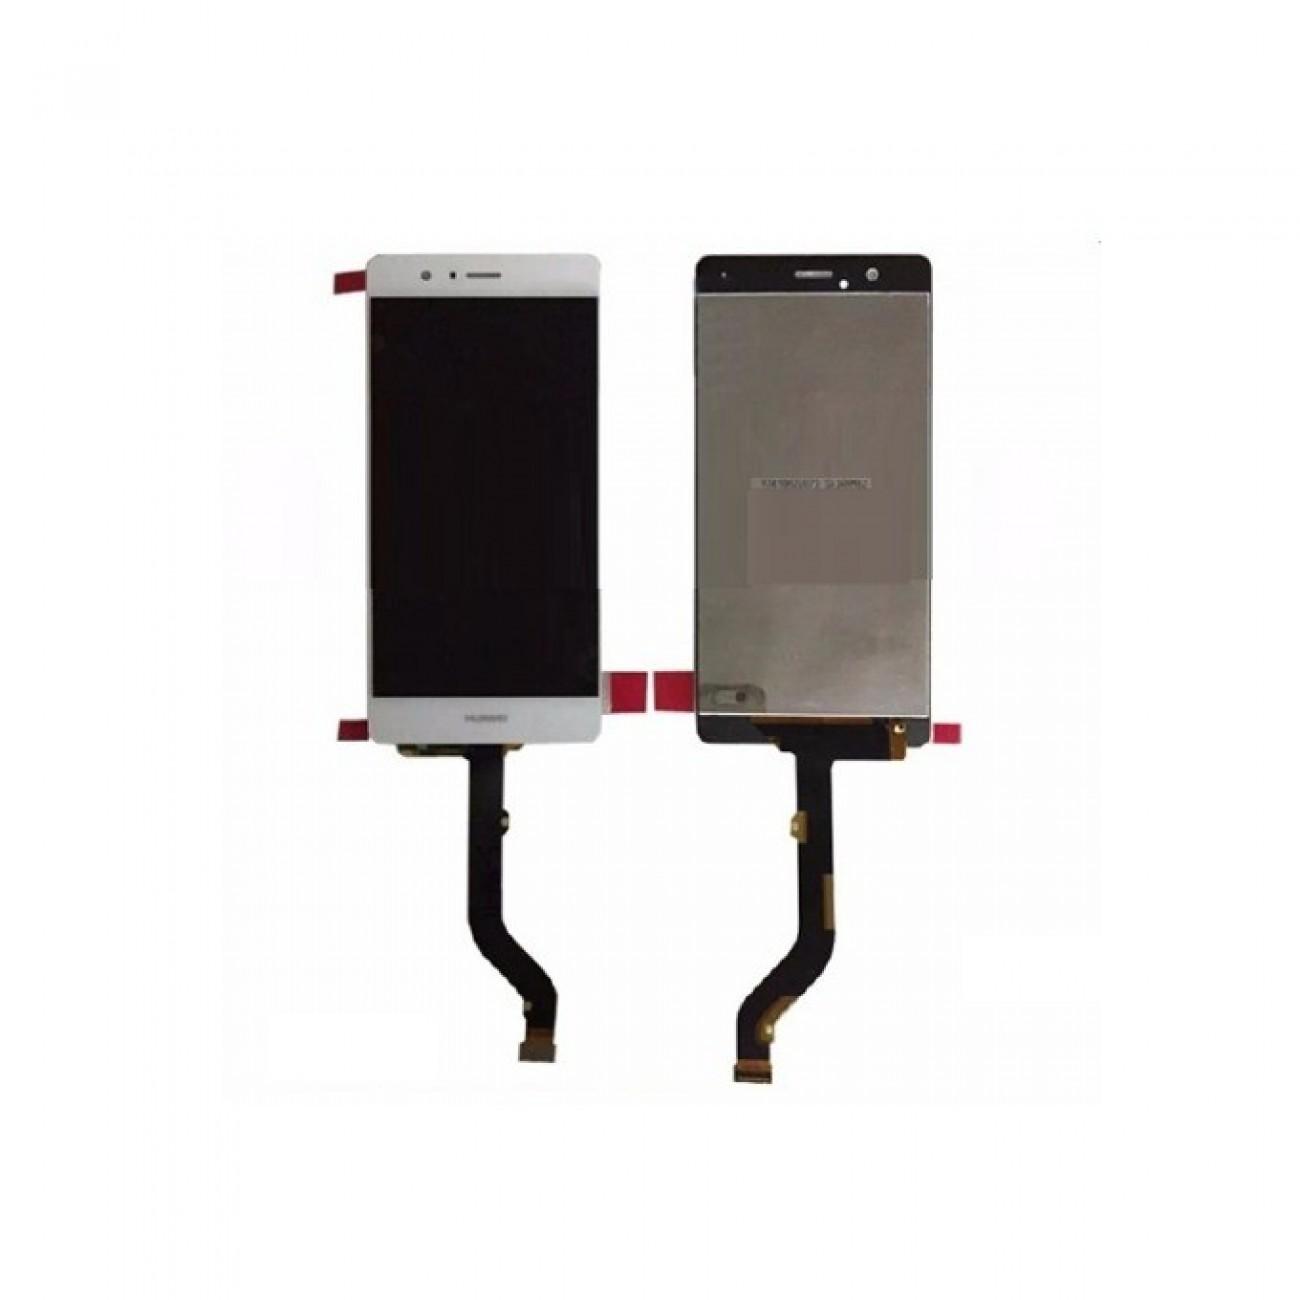 Дисплей зa Huawei Ascend P9, touch, бял в Резервни части -  | Alleop